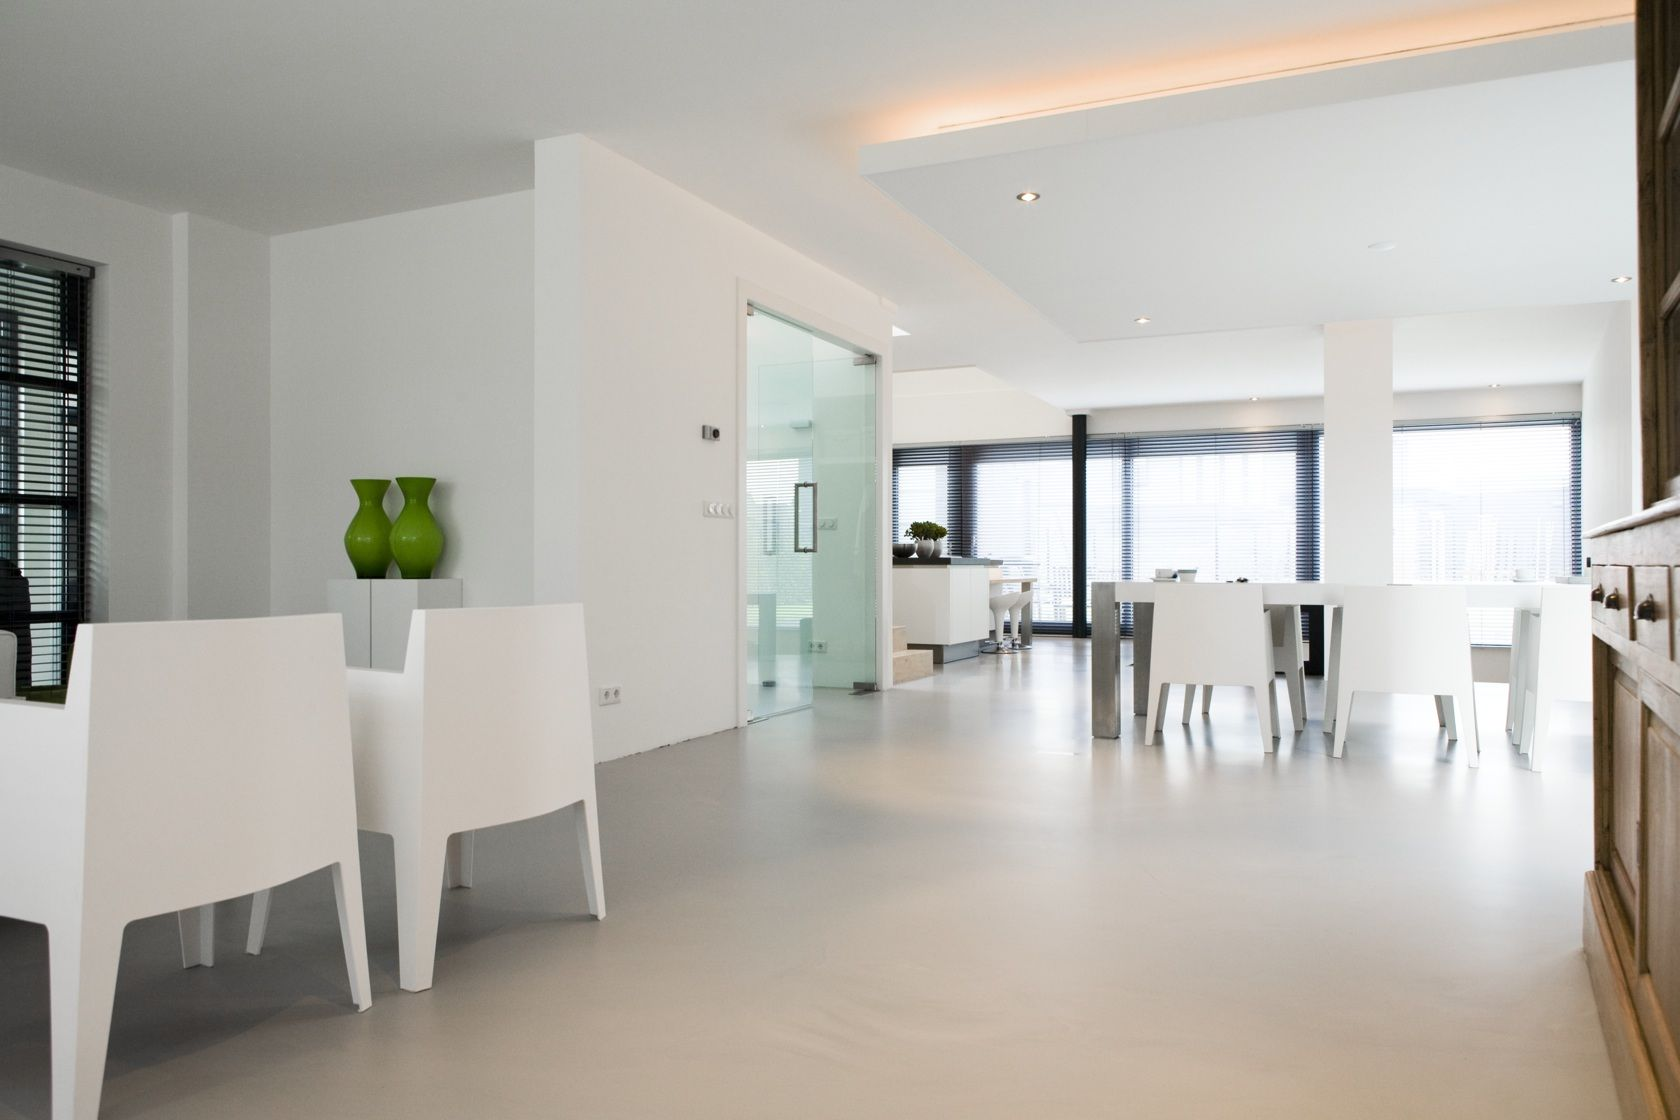 Resin Flooring Kitchen Senso Gietvloer Gietvloernl Senso Gietvloer Woonhuizen